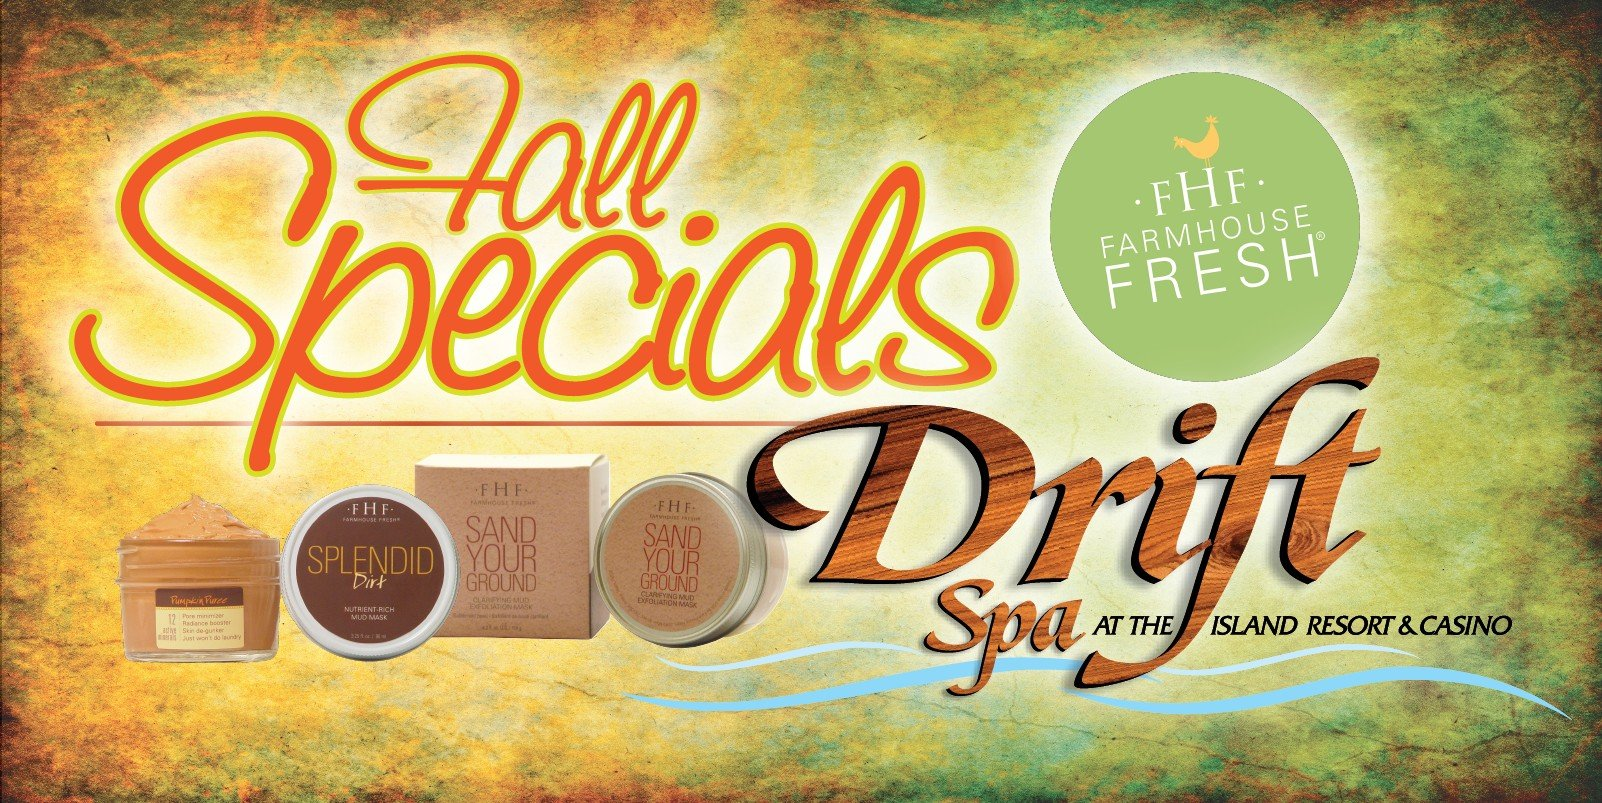 Web Header Drift Spa-Fall Specials